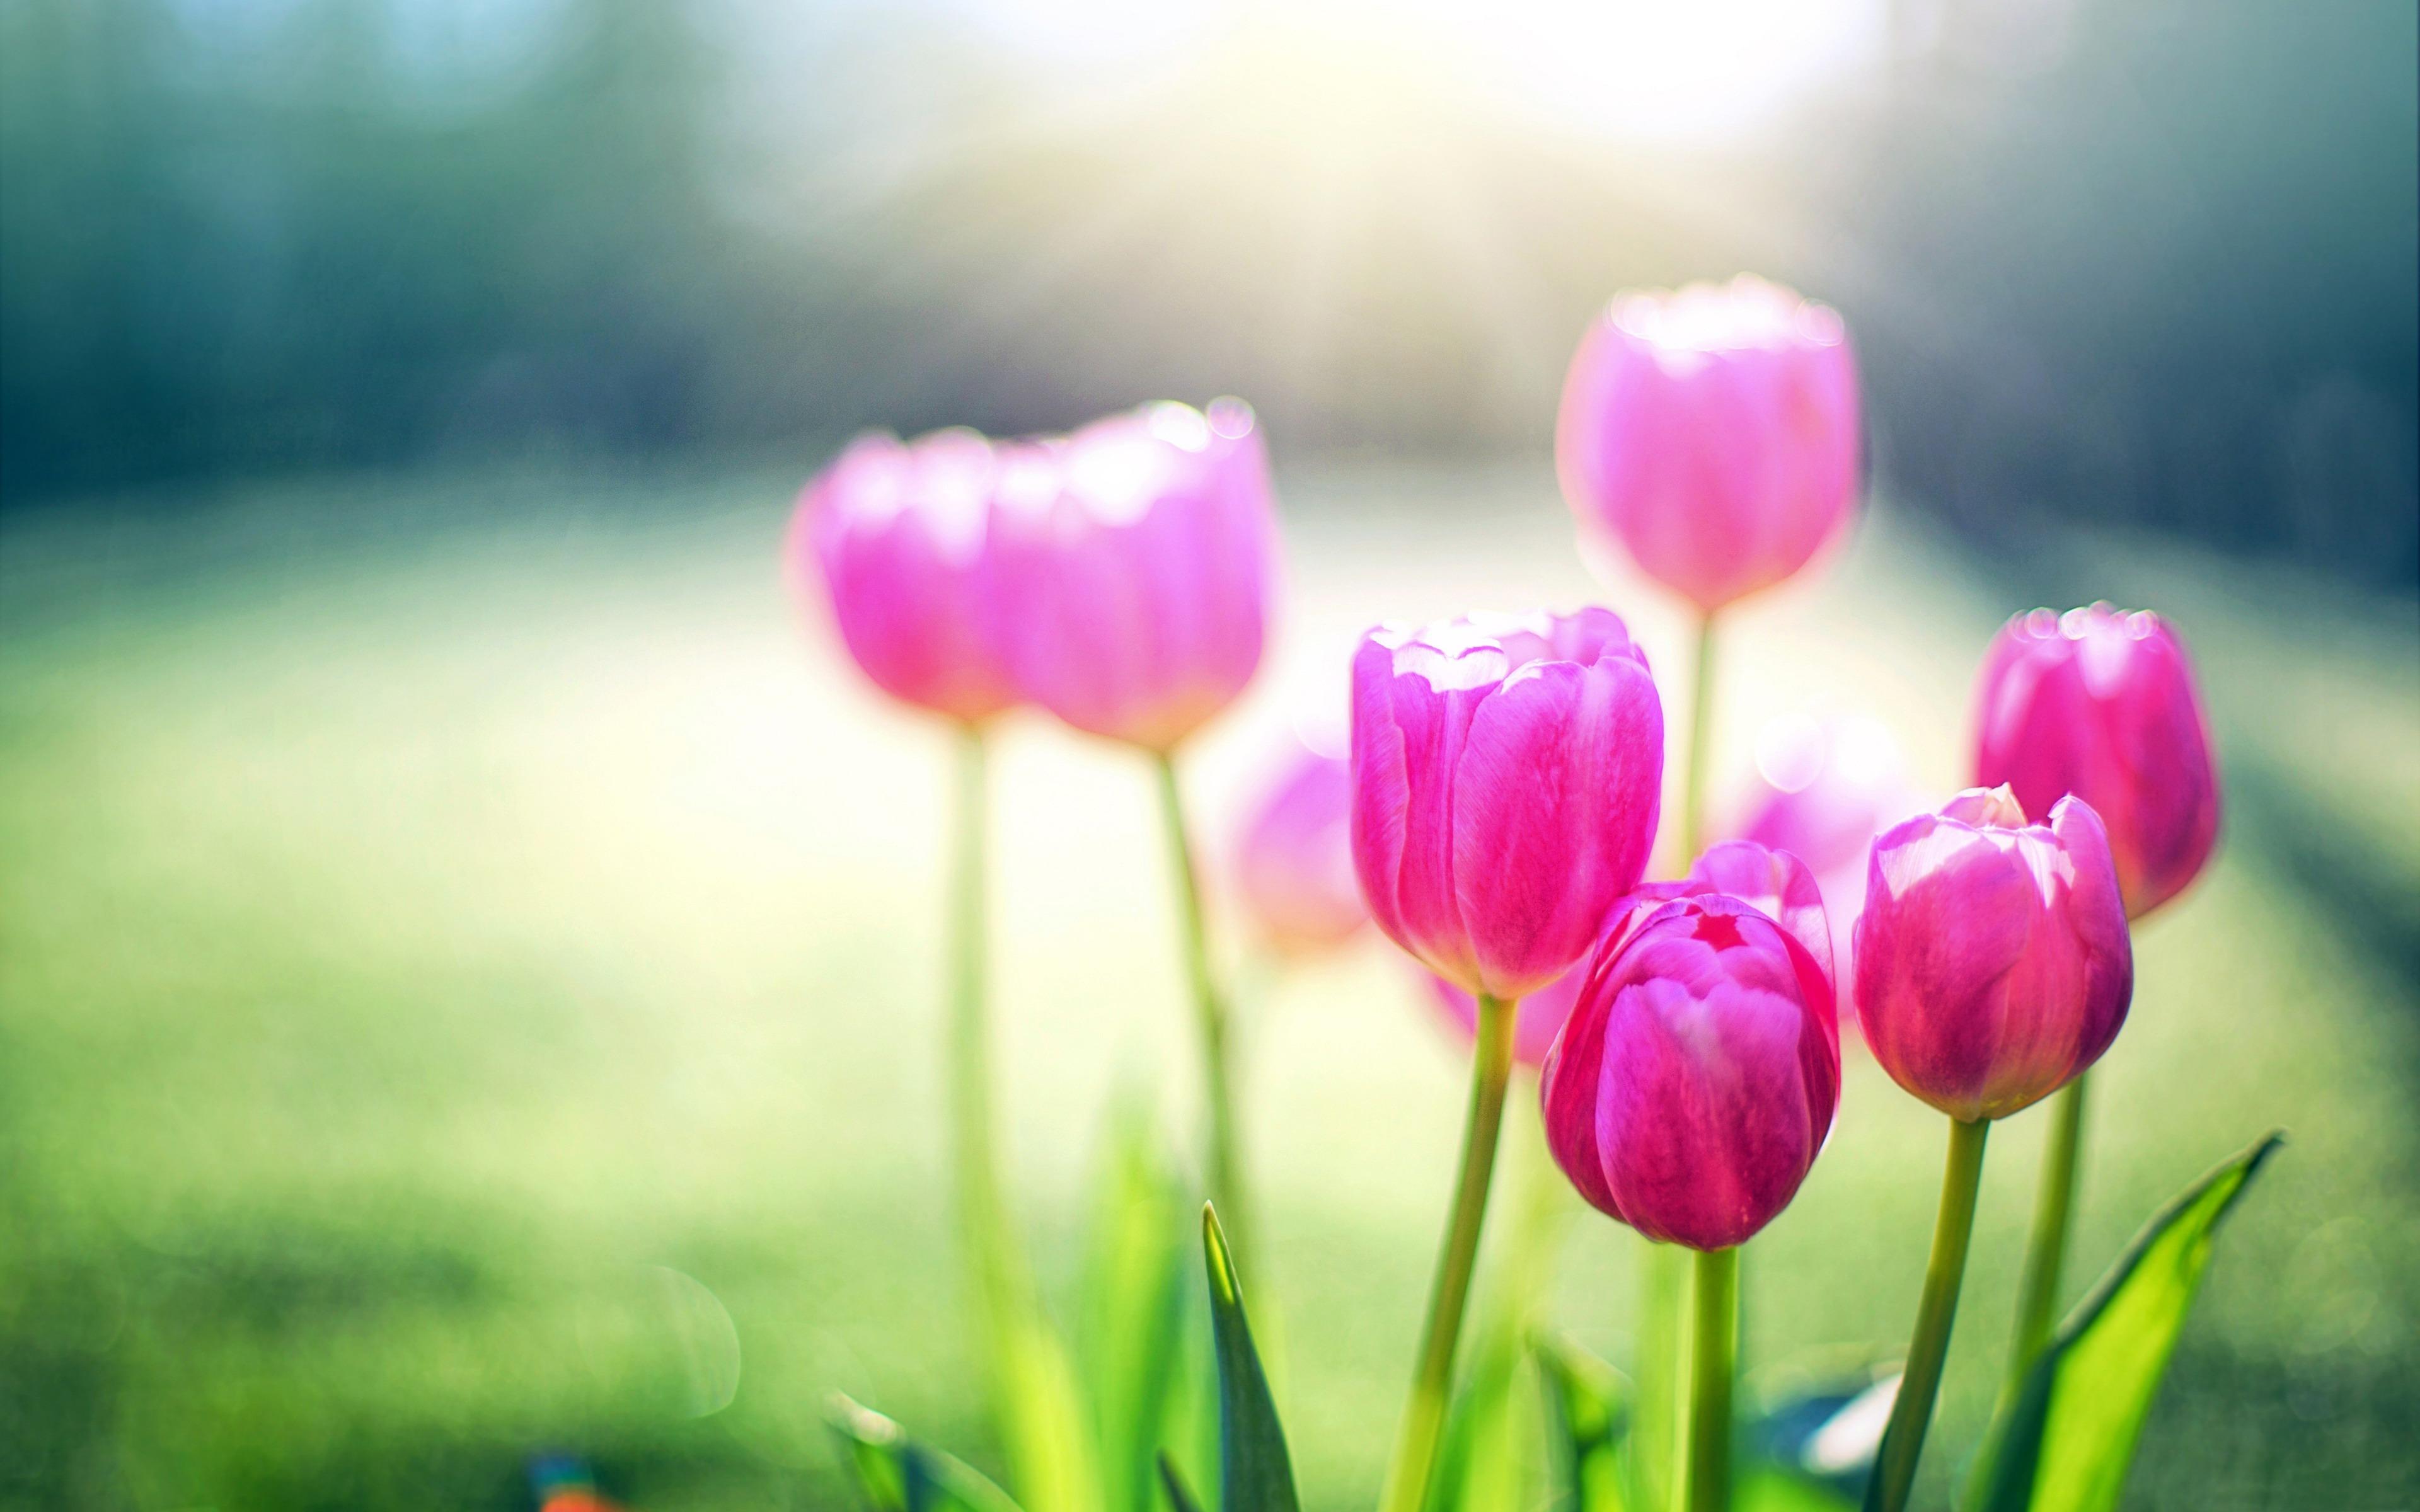 hình nền hoa tulip full hd